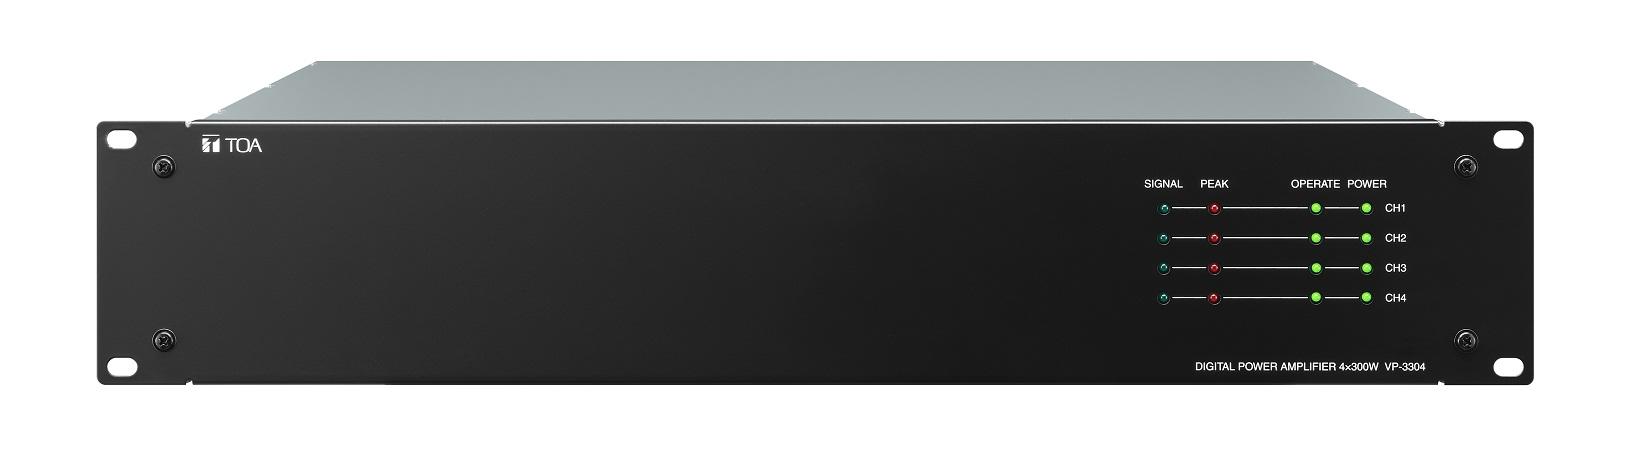 VP-3504 | TOA Corporation